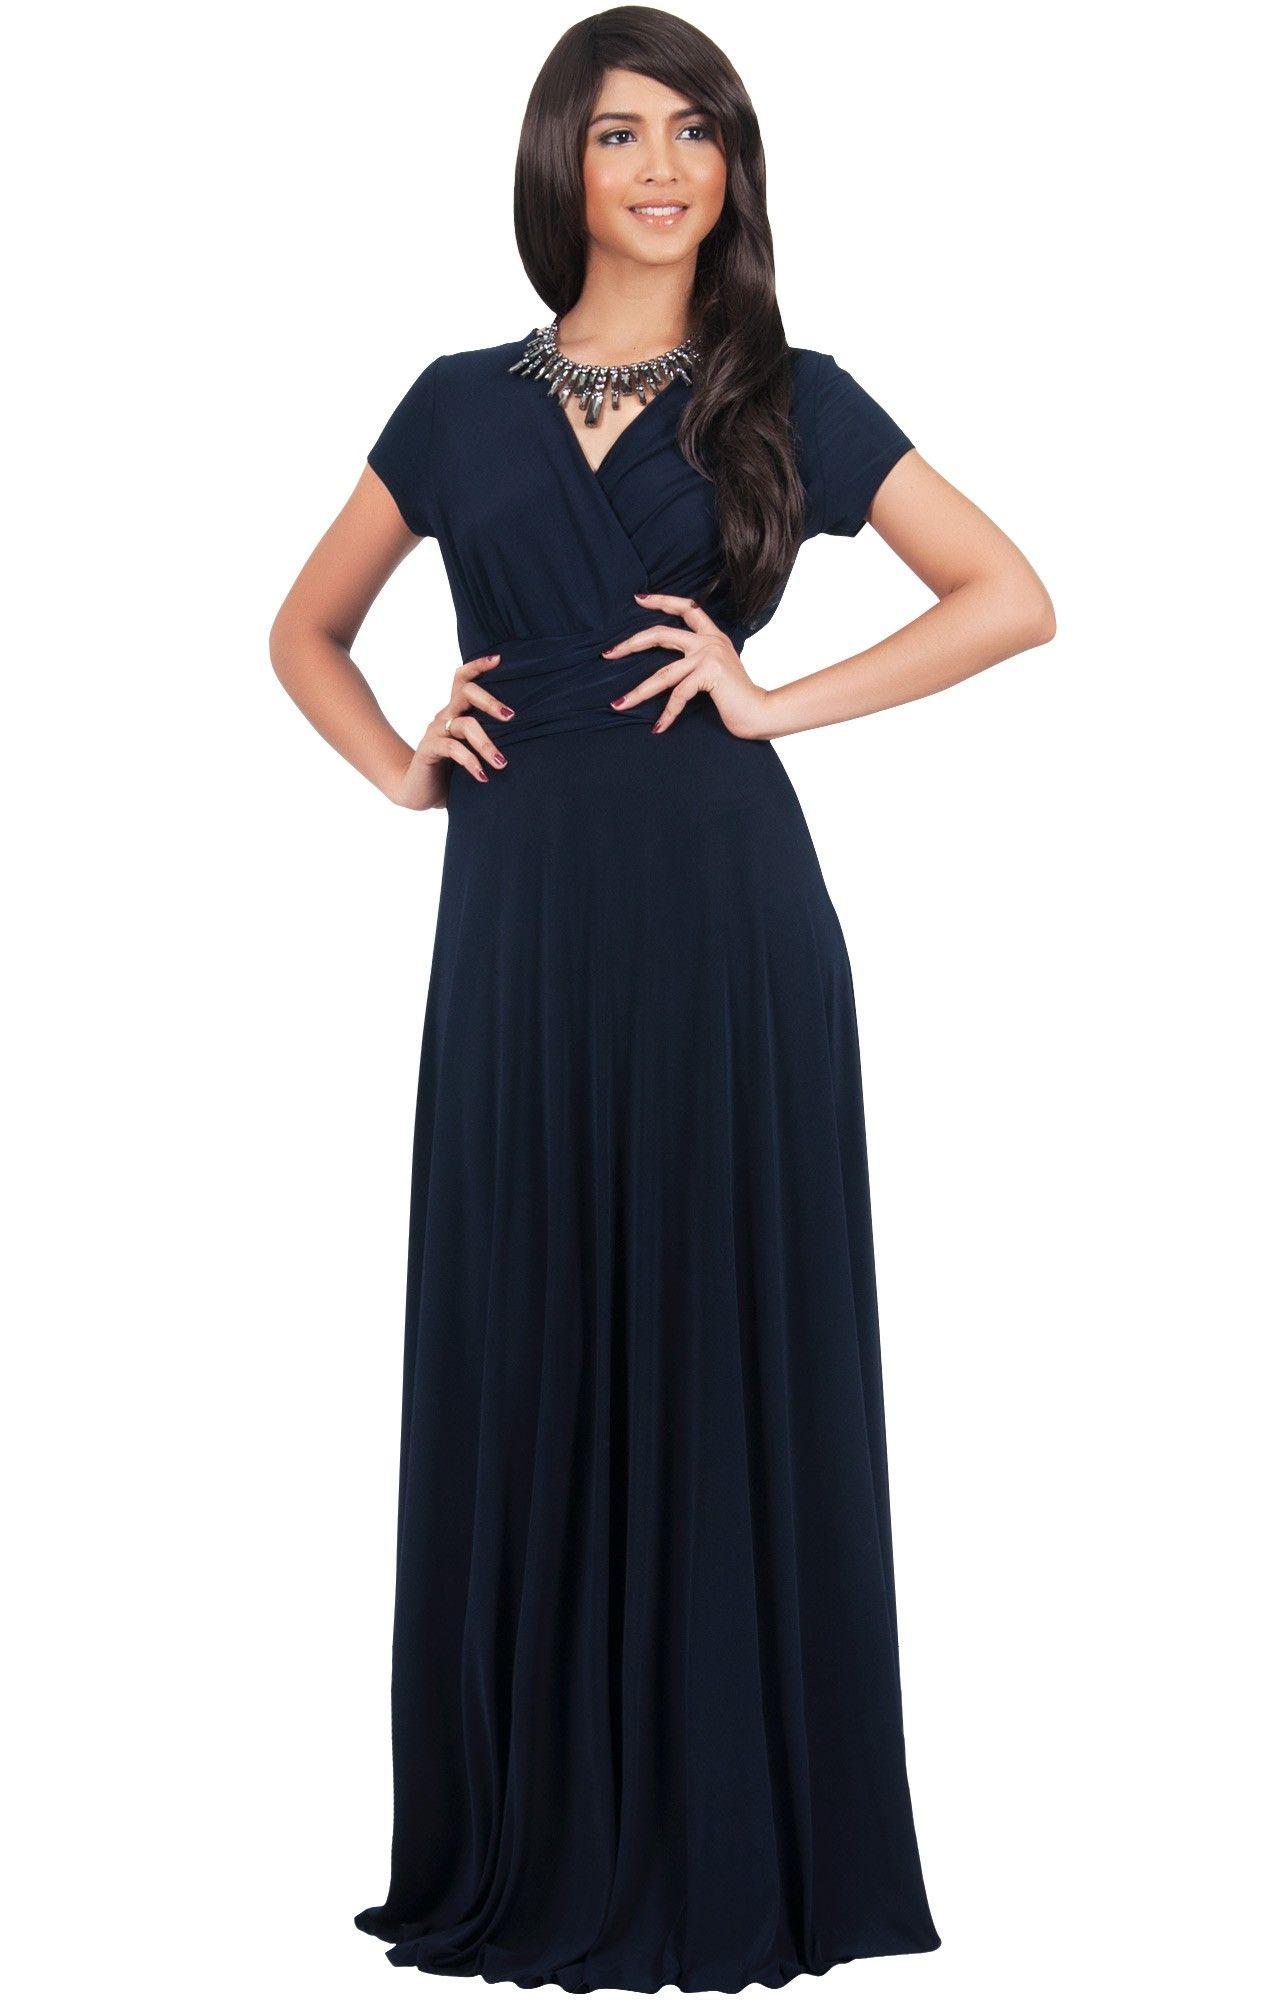 Juliana flowy cap sleeve maxi dress long work gown vneck formal